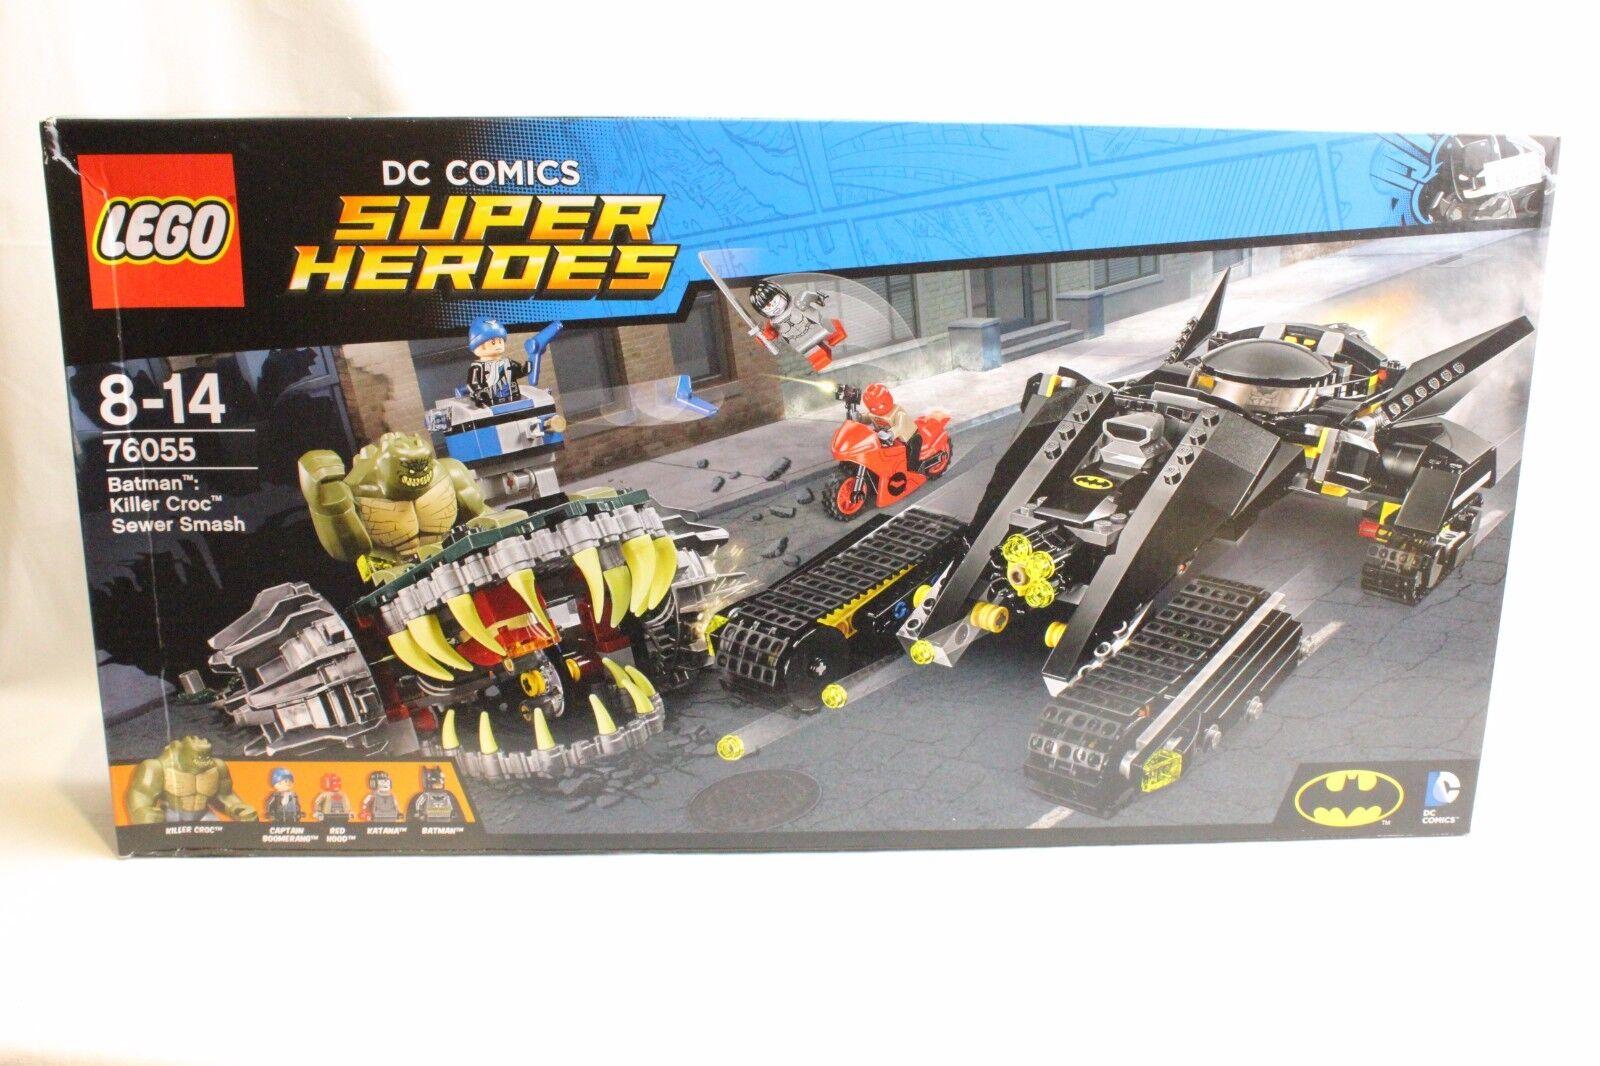 LEGO 76055 BATMAN KILLER CROC SEWER SMASH SUPER HEROES